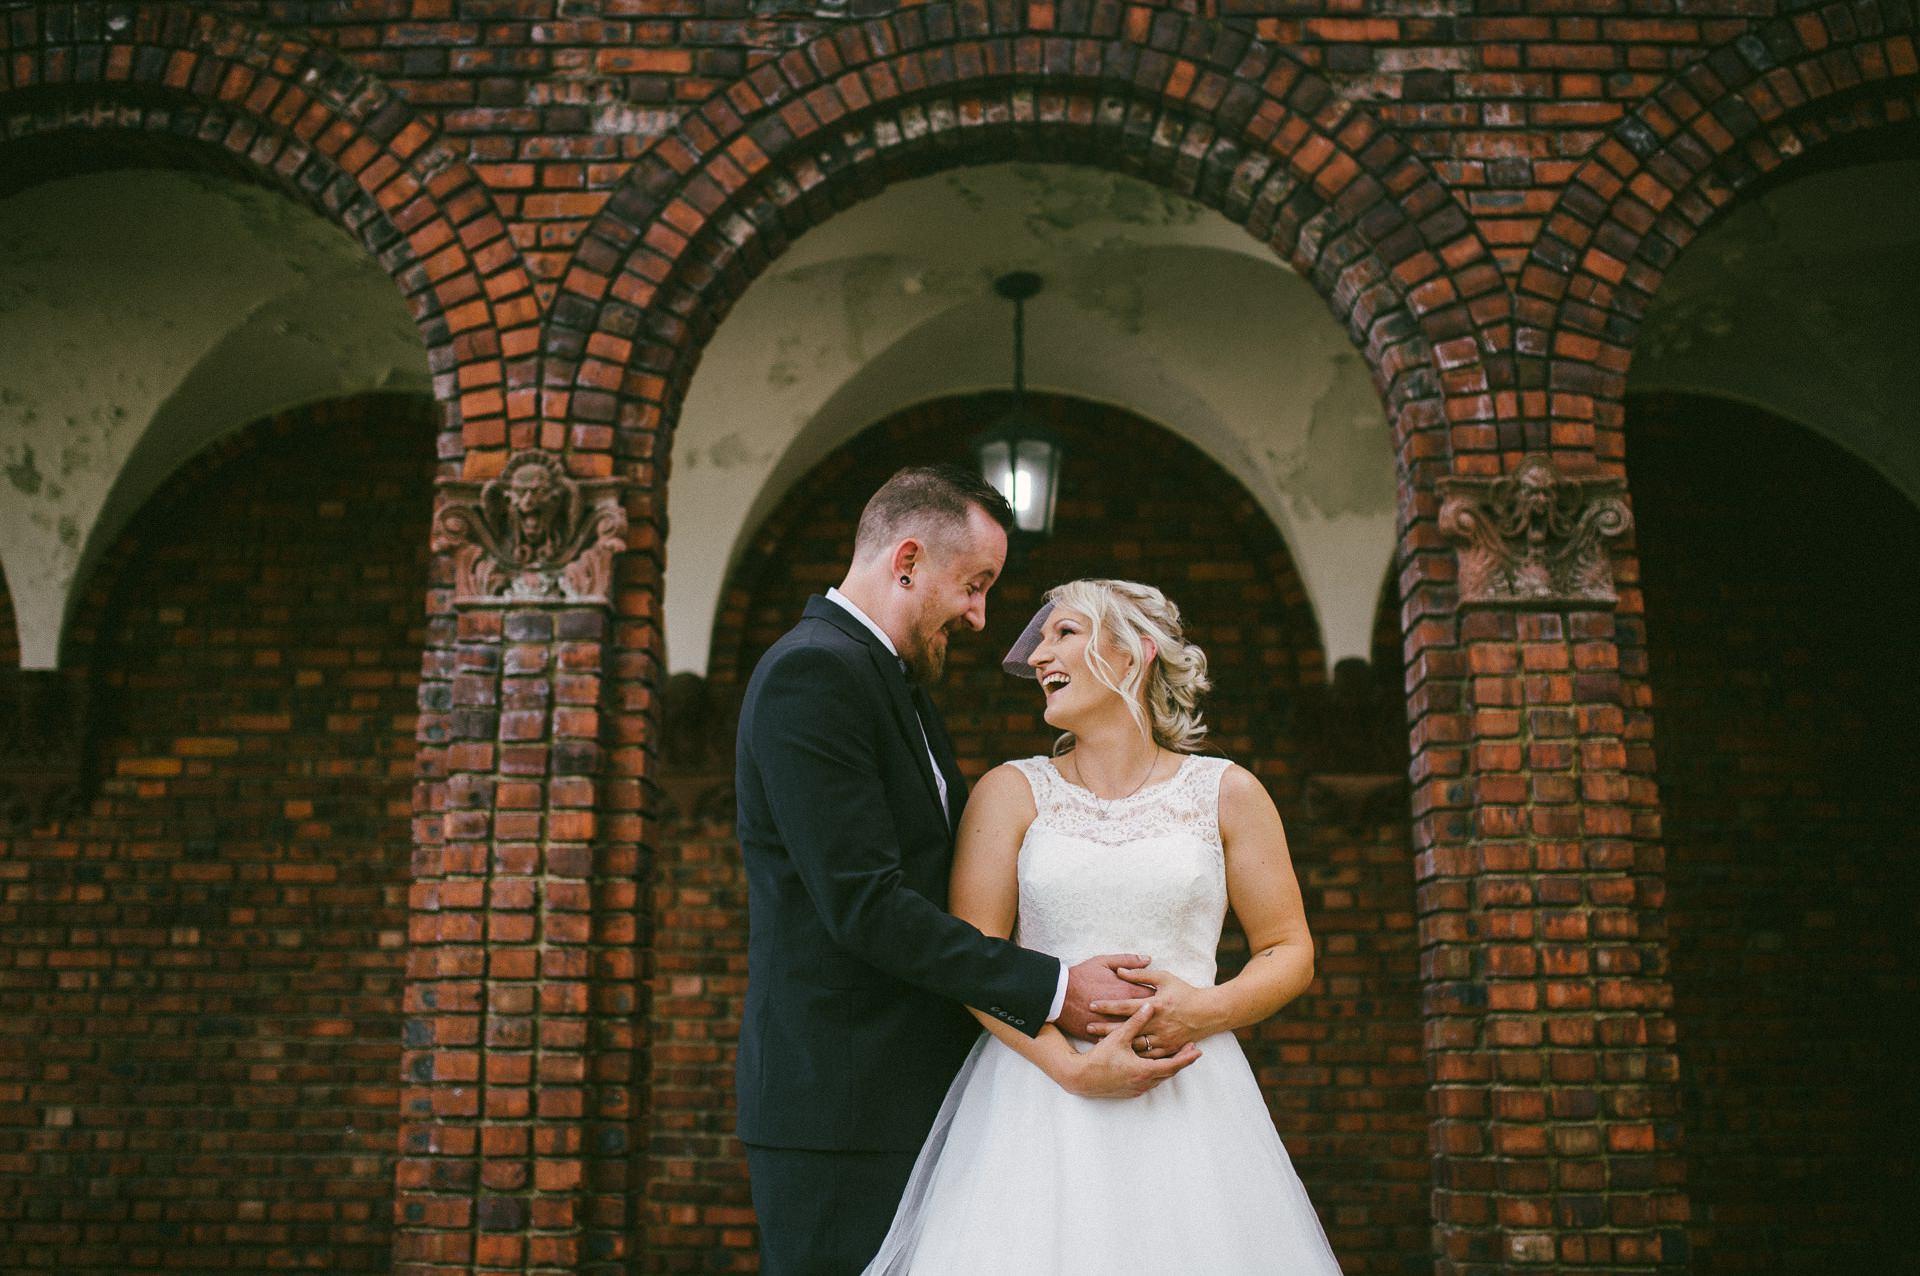 Goldhorn Brewery Wedding Photos in Cleveland 1 1.jpg